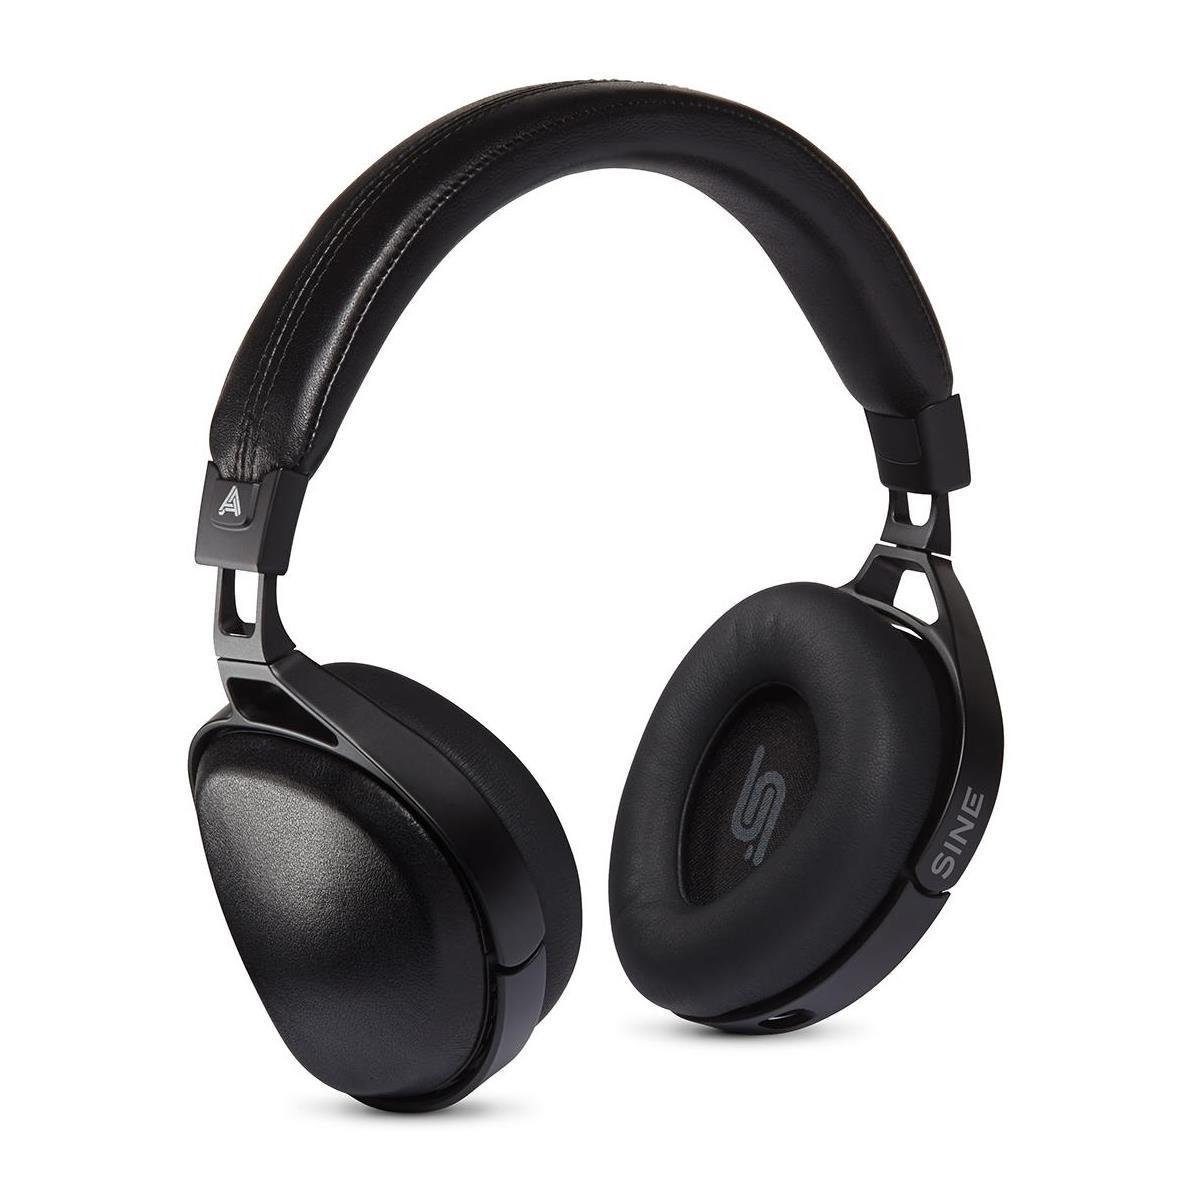 Audeze Sine Planar Magnetic On-Ear Closed-Back Headphones $320 + Free Shipping